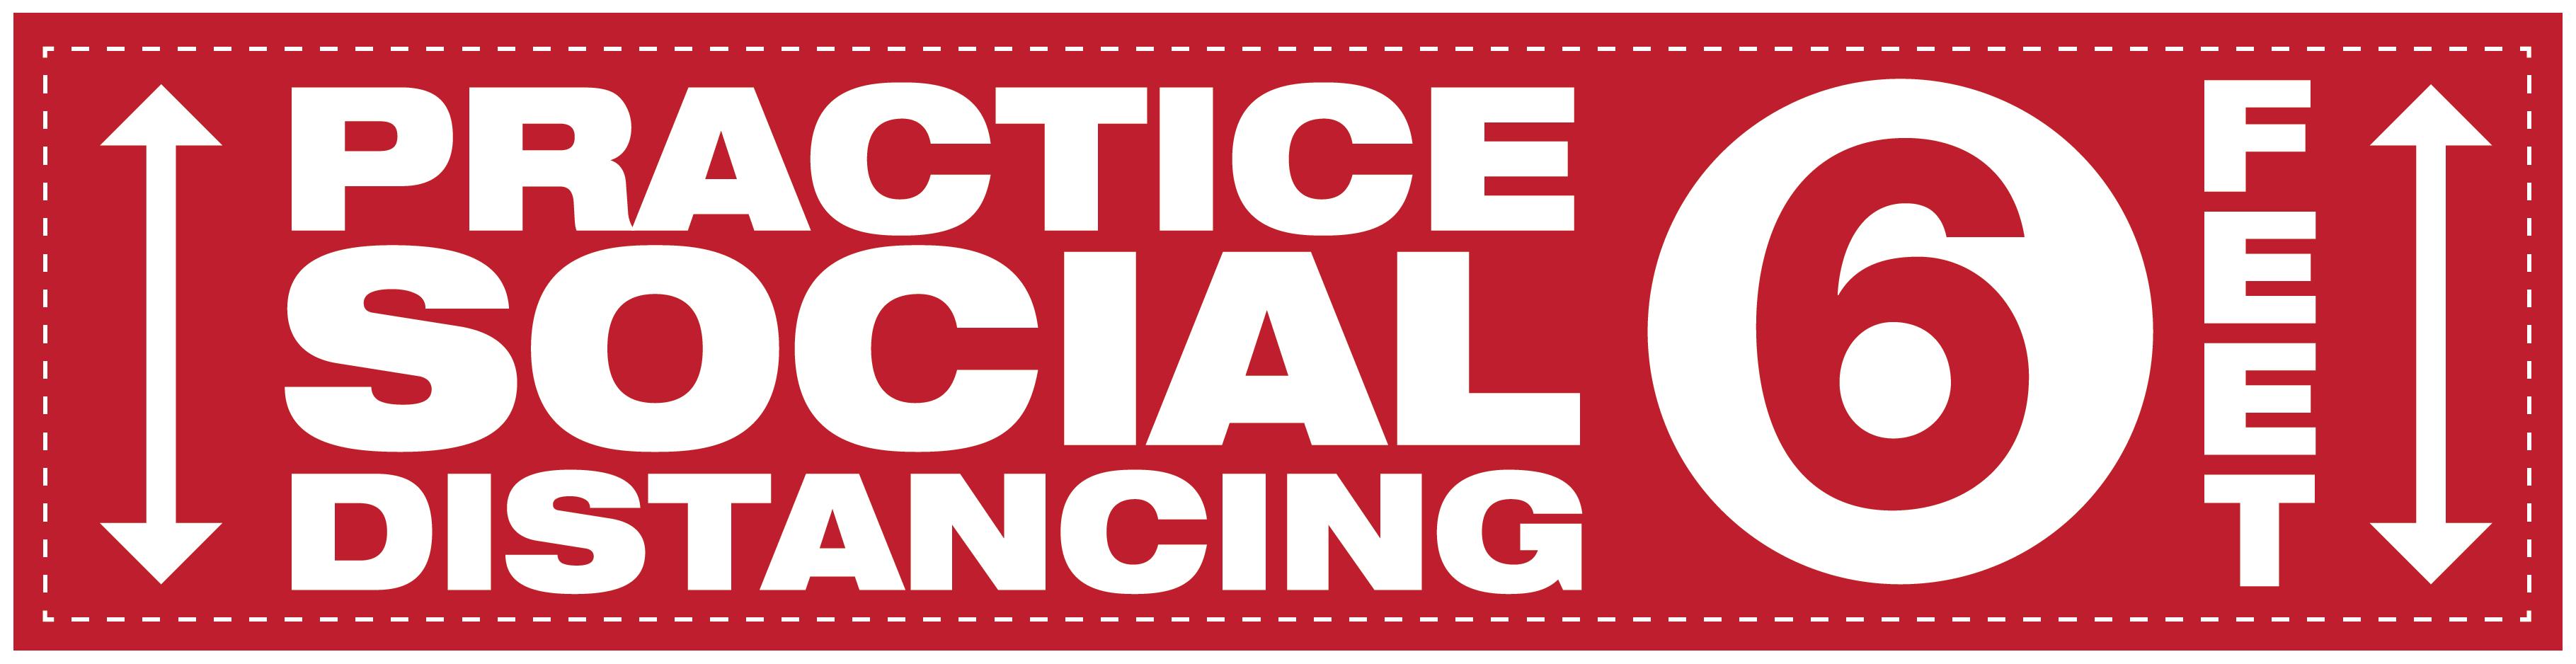 Social Distancing Floor Graphic